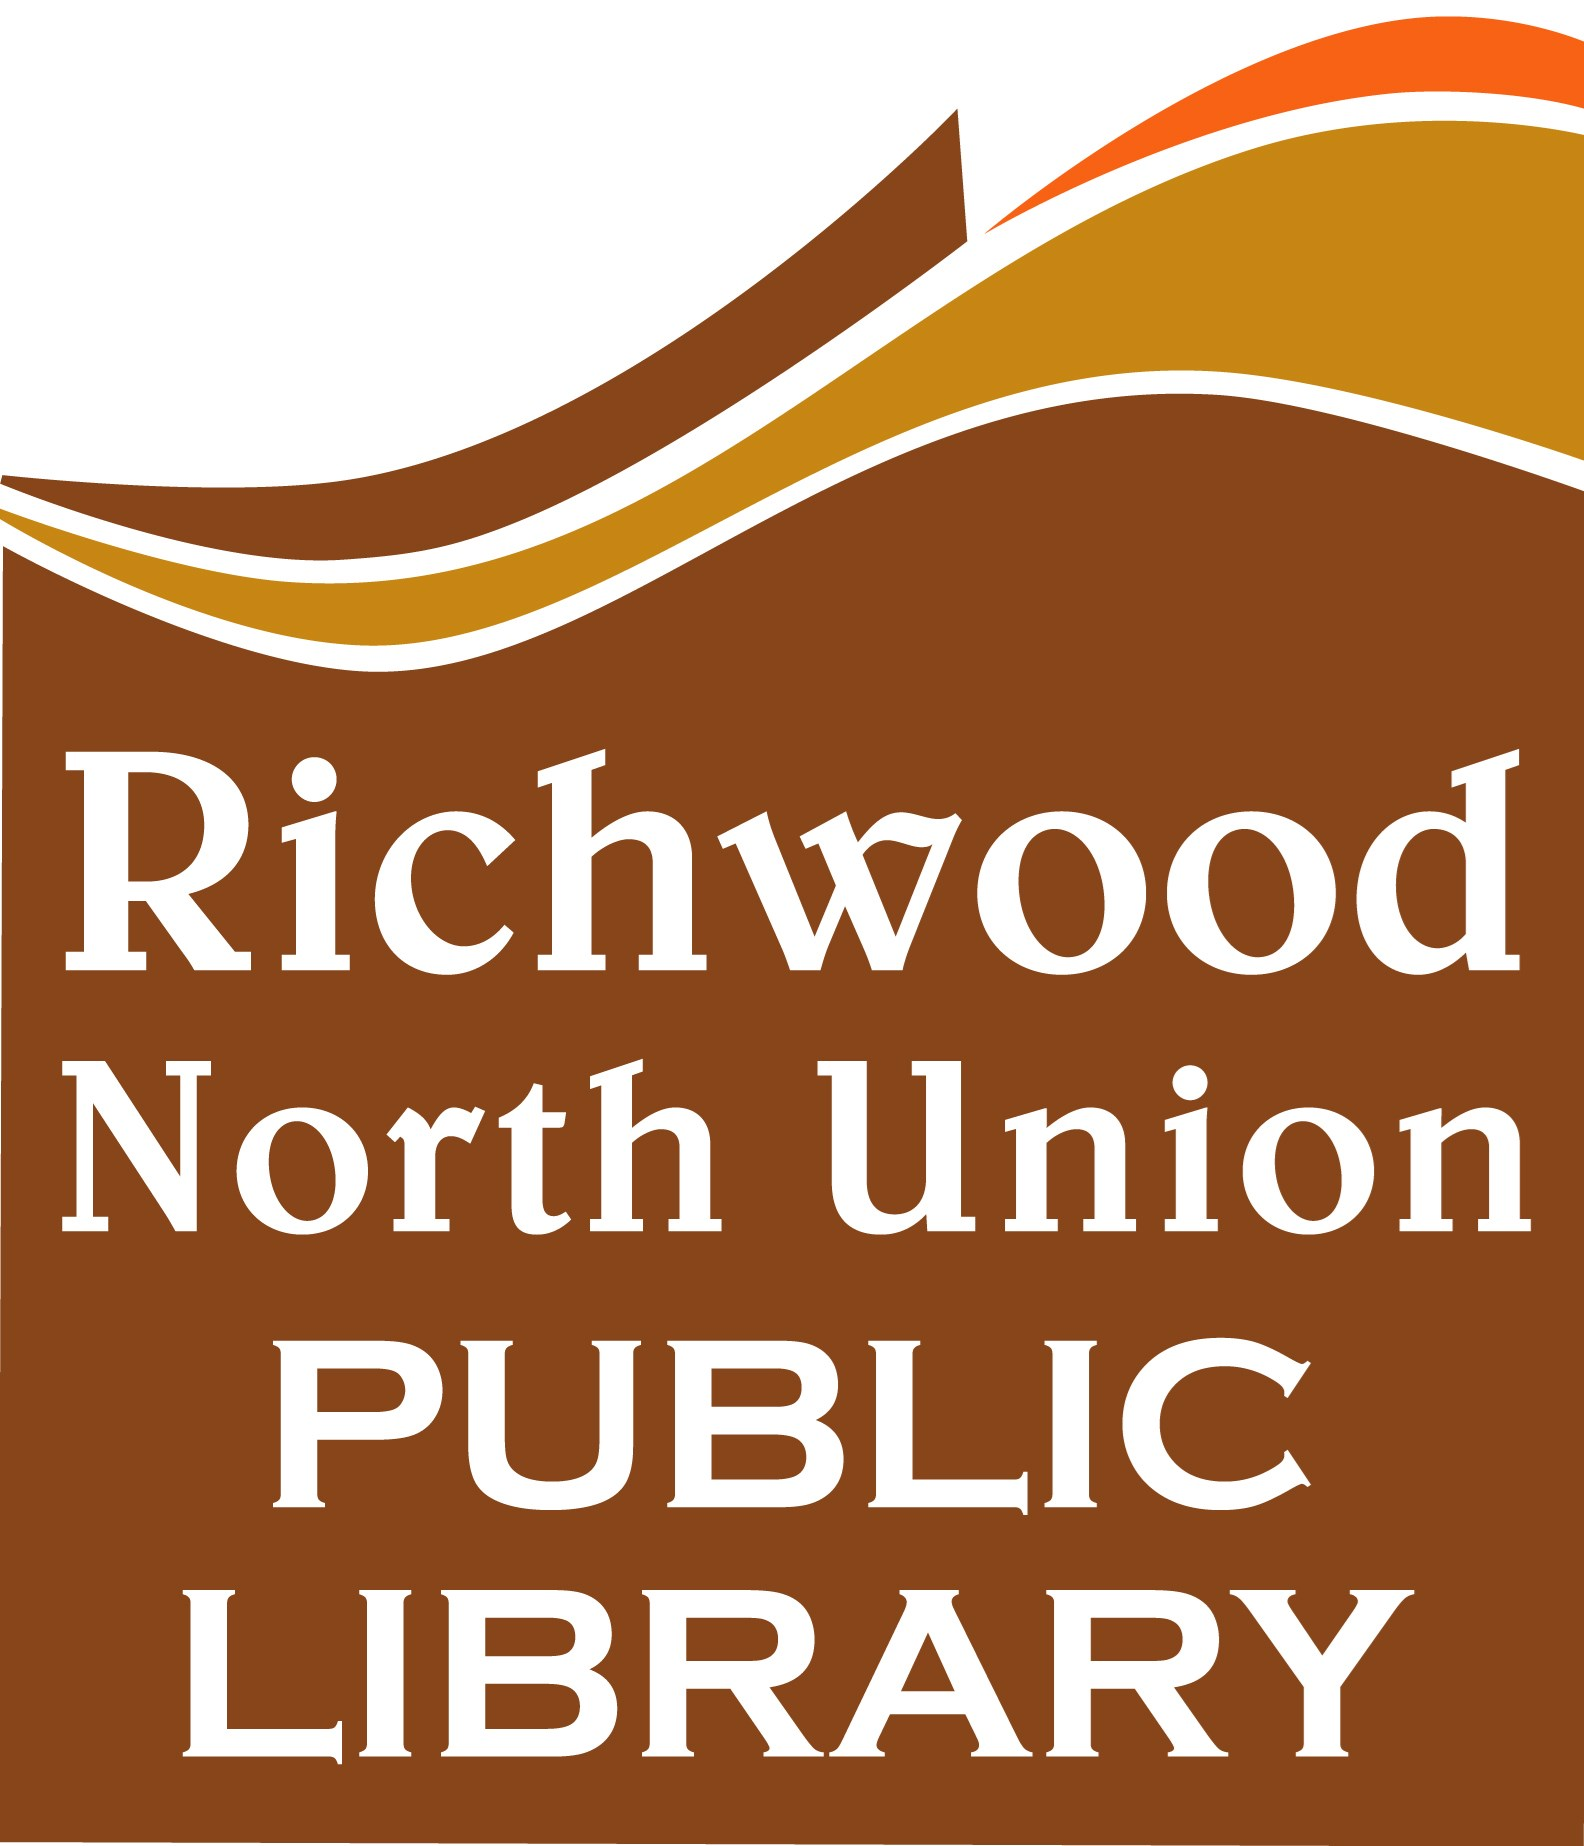 Richwood-North Union Public Library